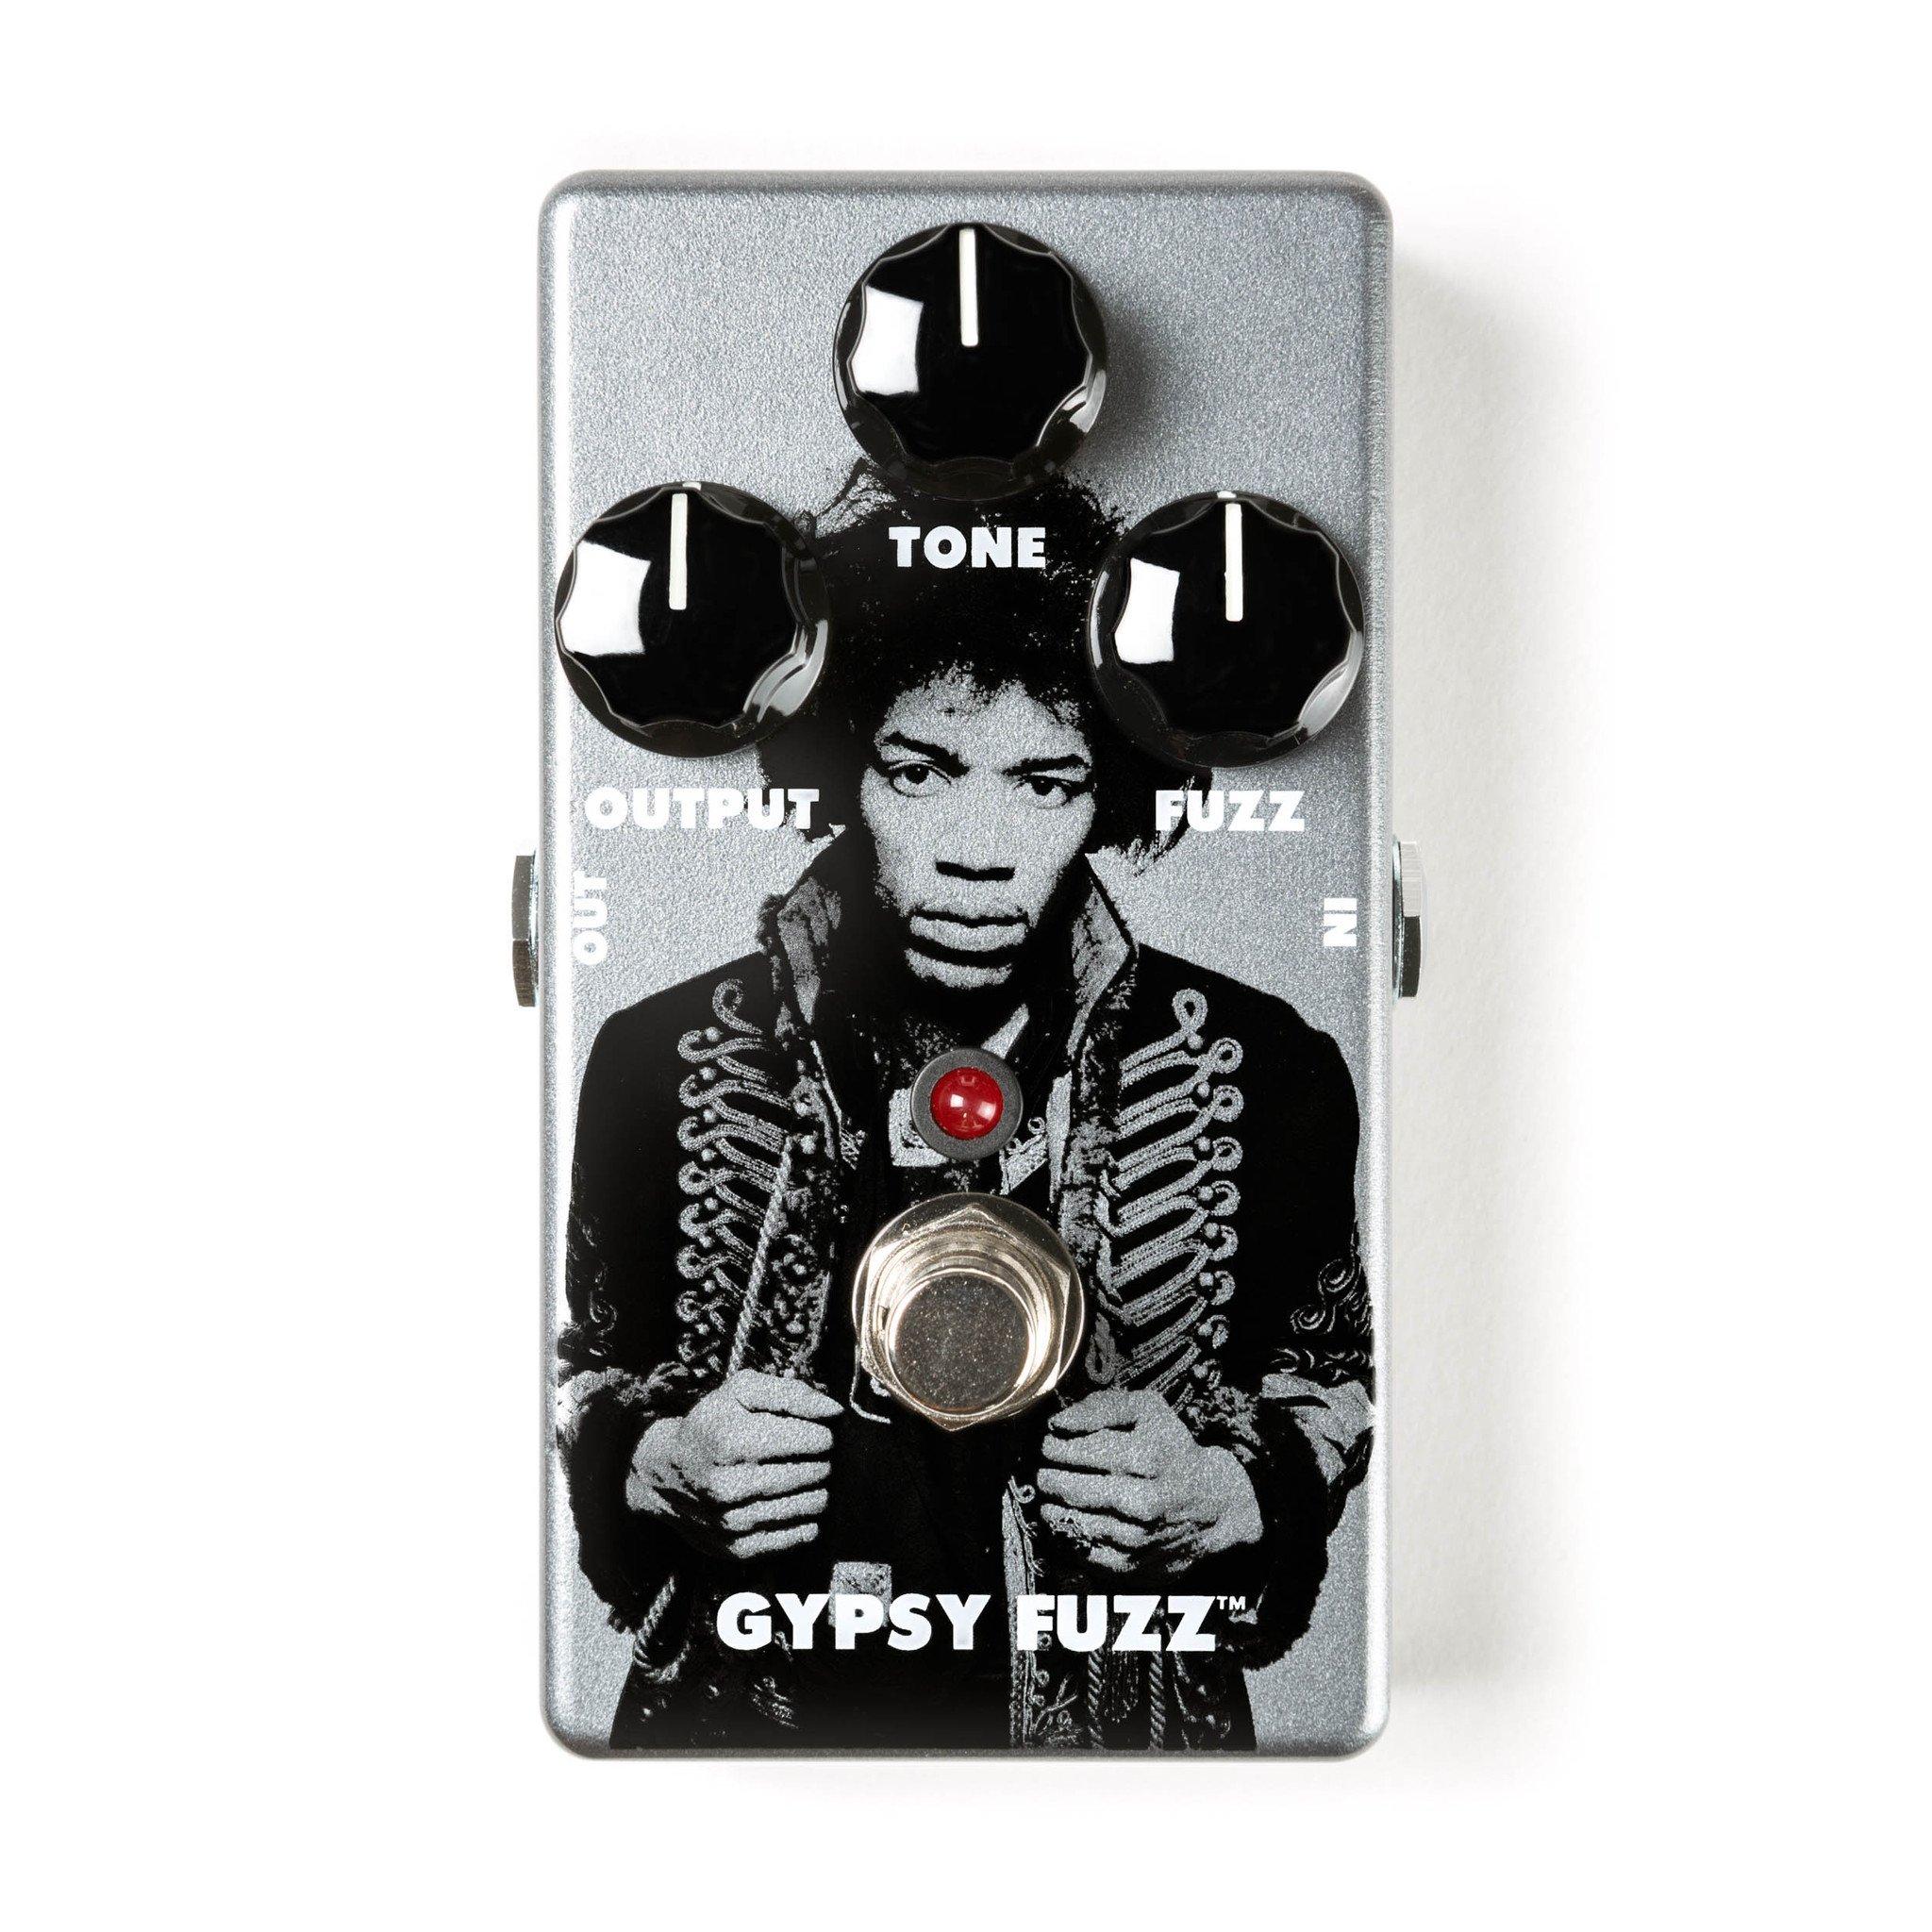 Dunlop JHM8 Jimi Hendrix Gypsy Fuzz Pedal w/Bonus Patch Cord & RIS Picks (x3) 710137099135 by Rock Island Sound